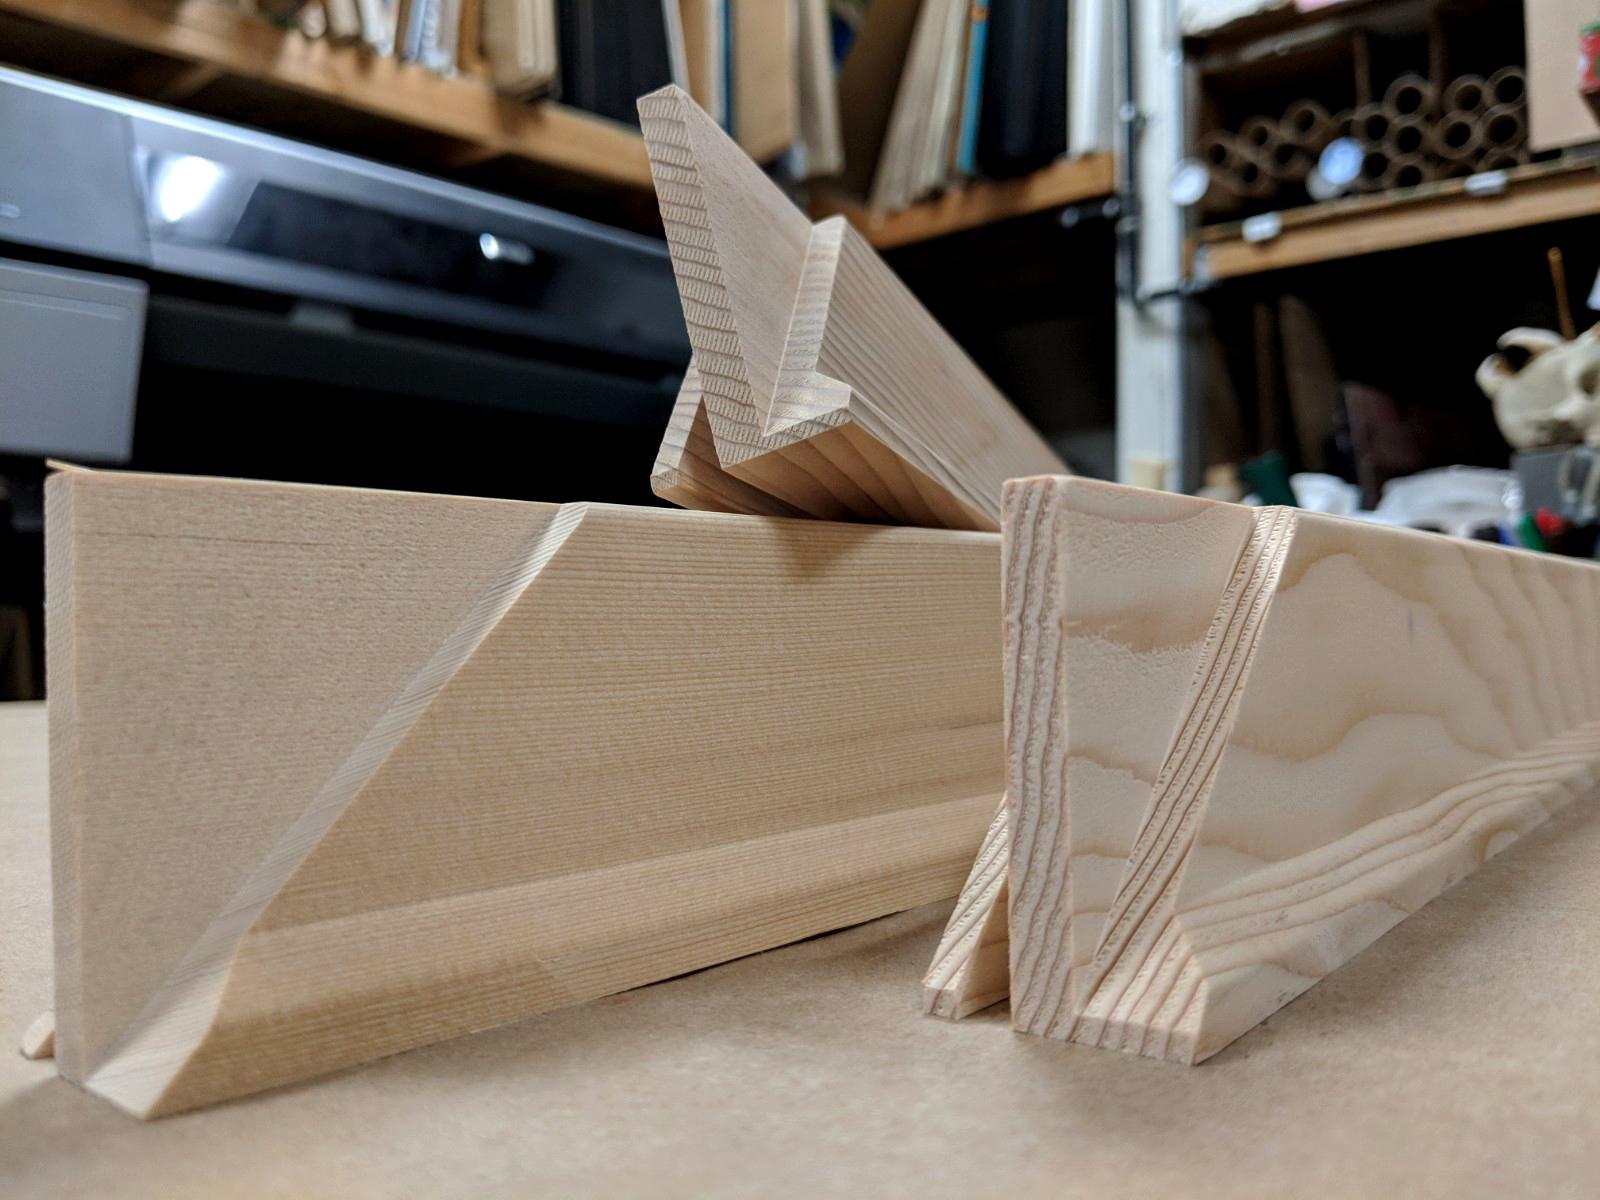 Wooden stretcher bars